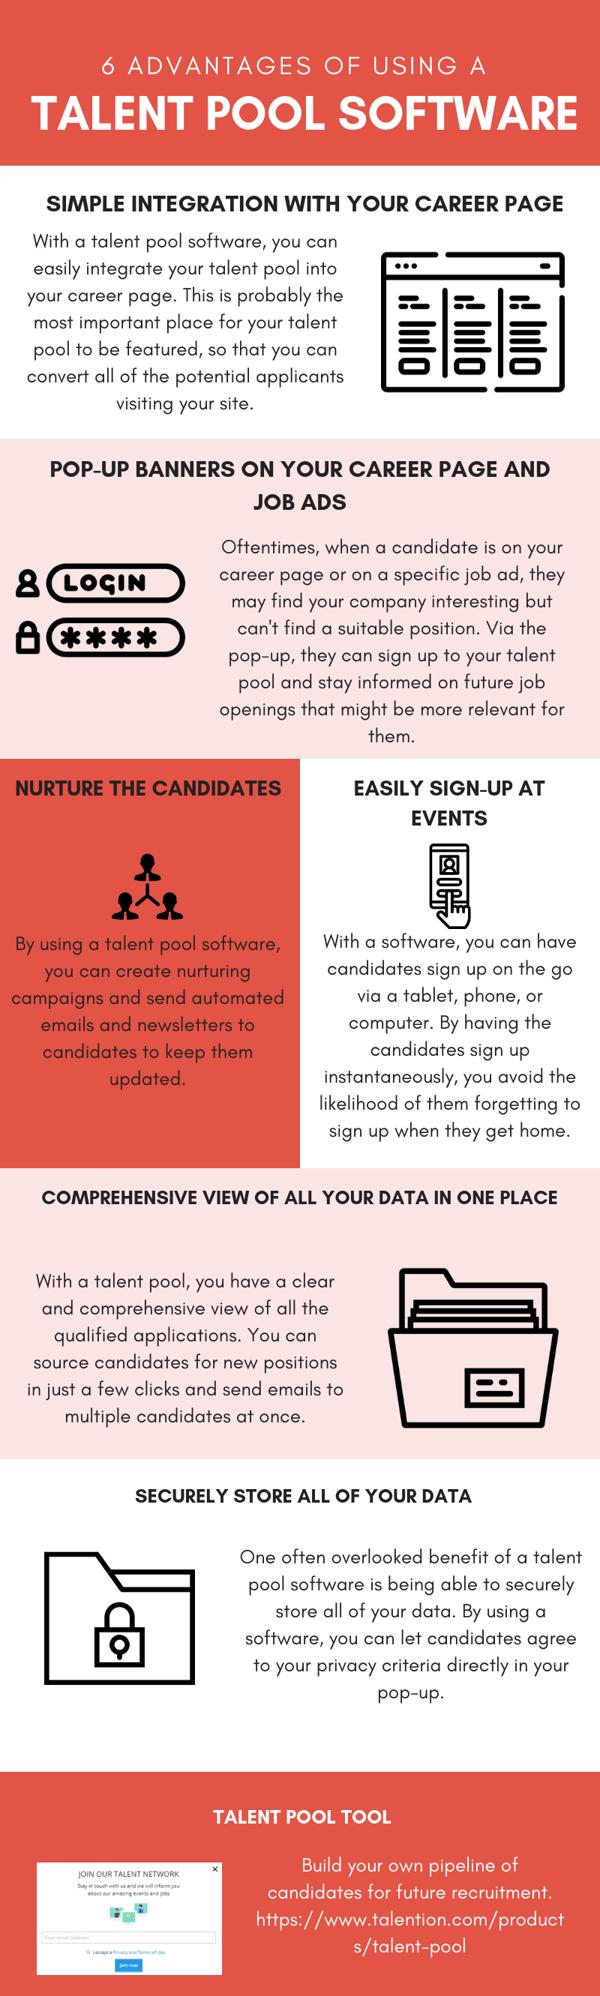 6 advantages of using a Talent Pool Software-1